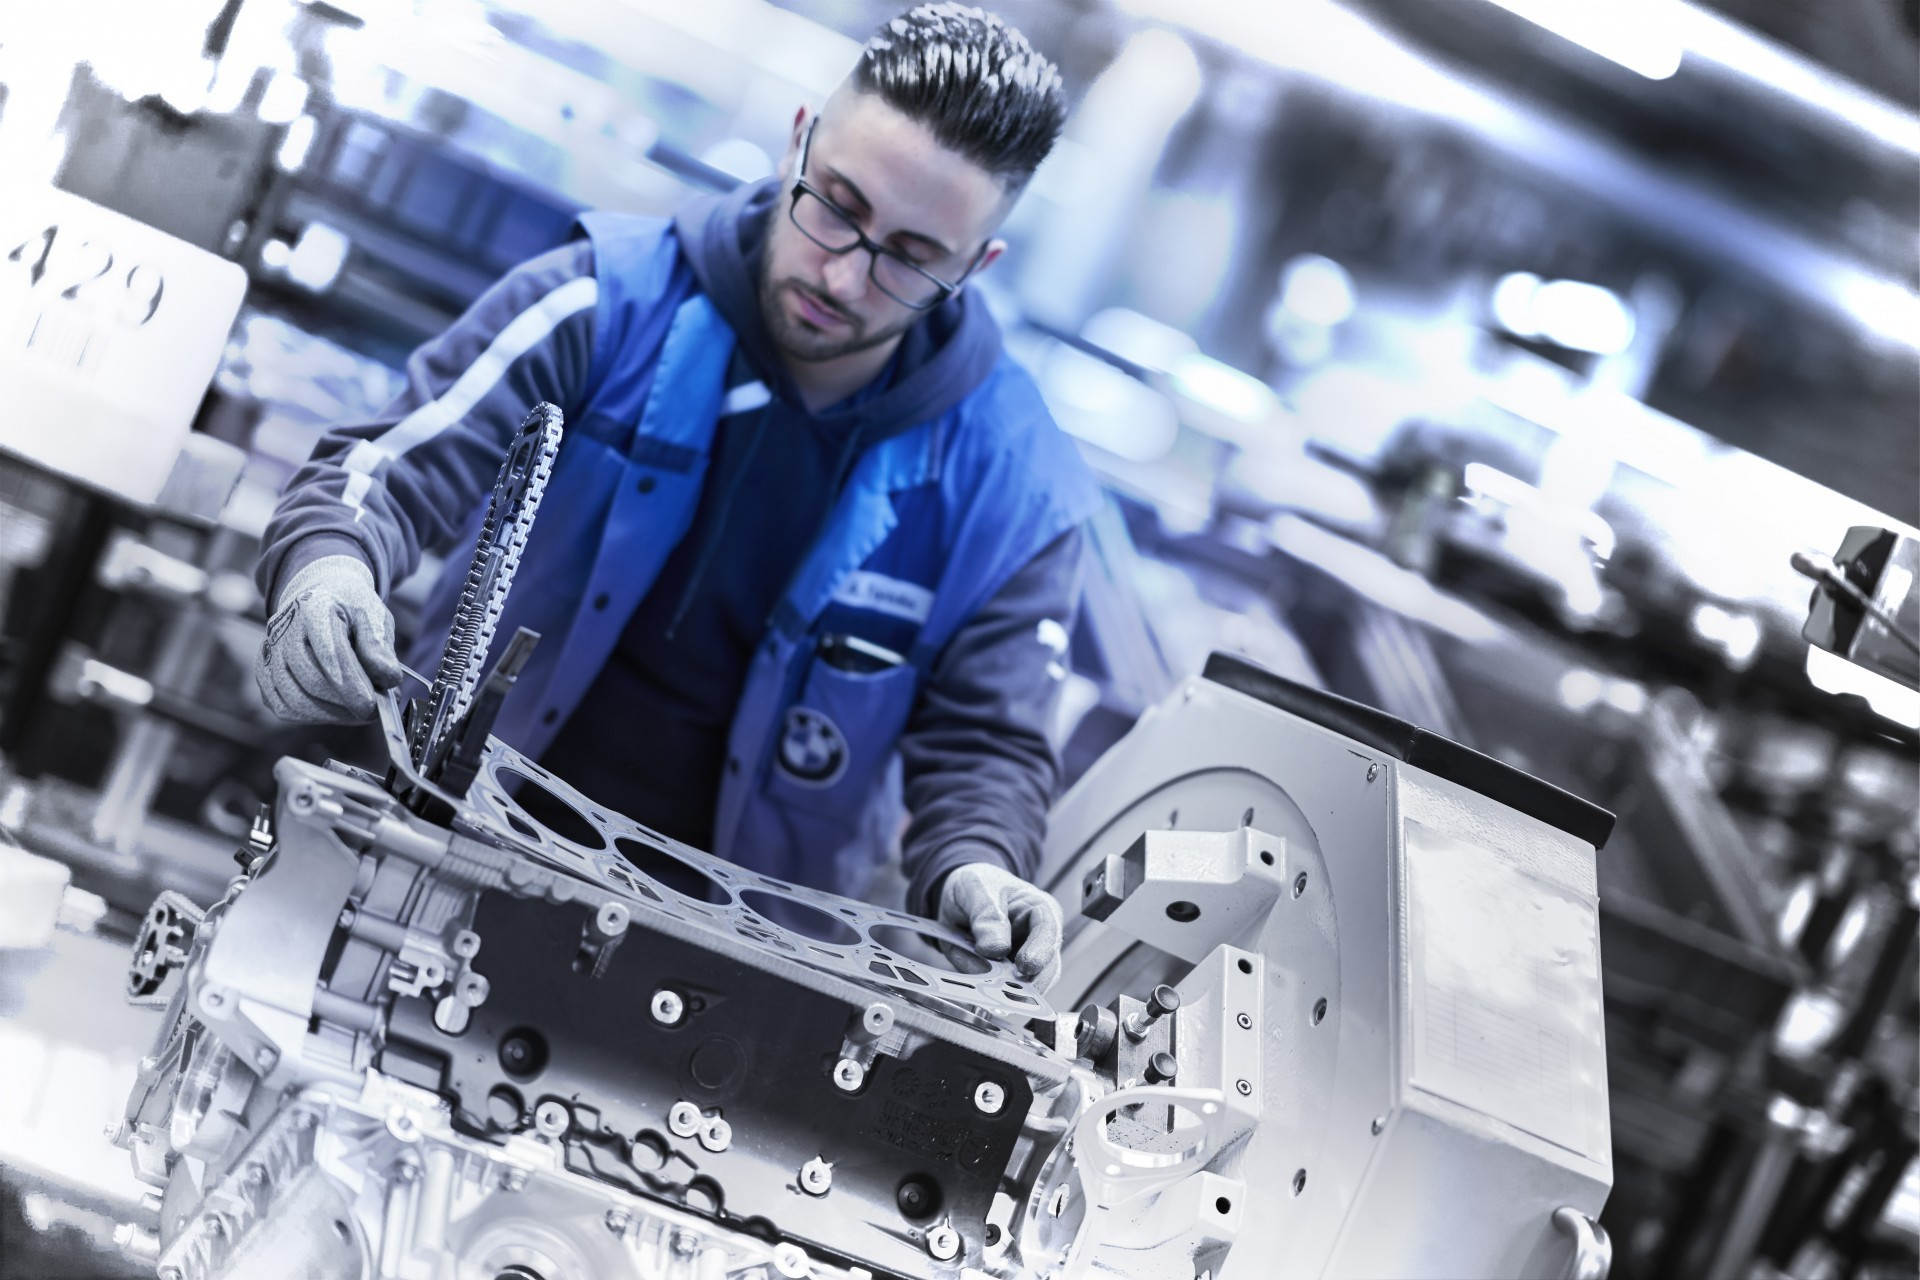 BMW V8 engine 11